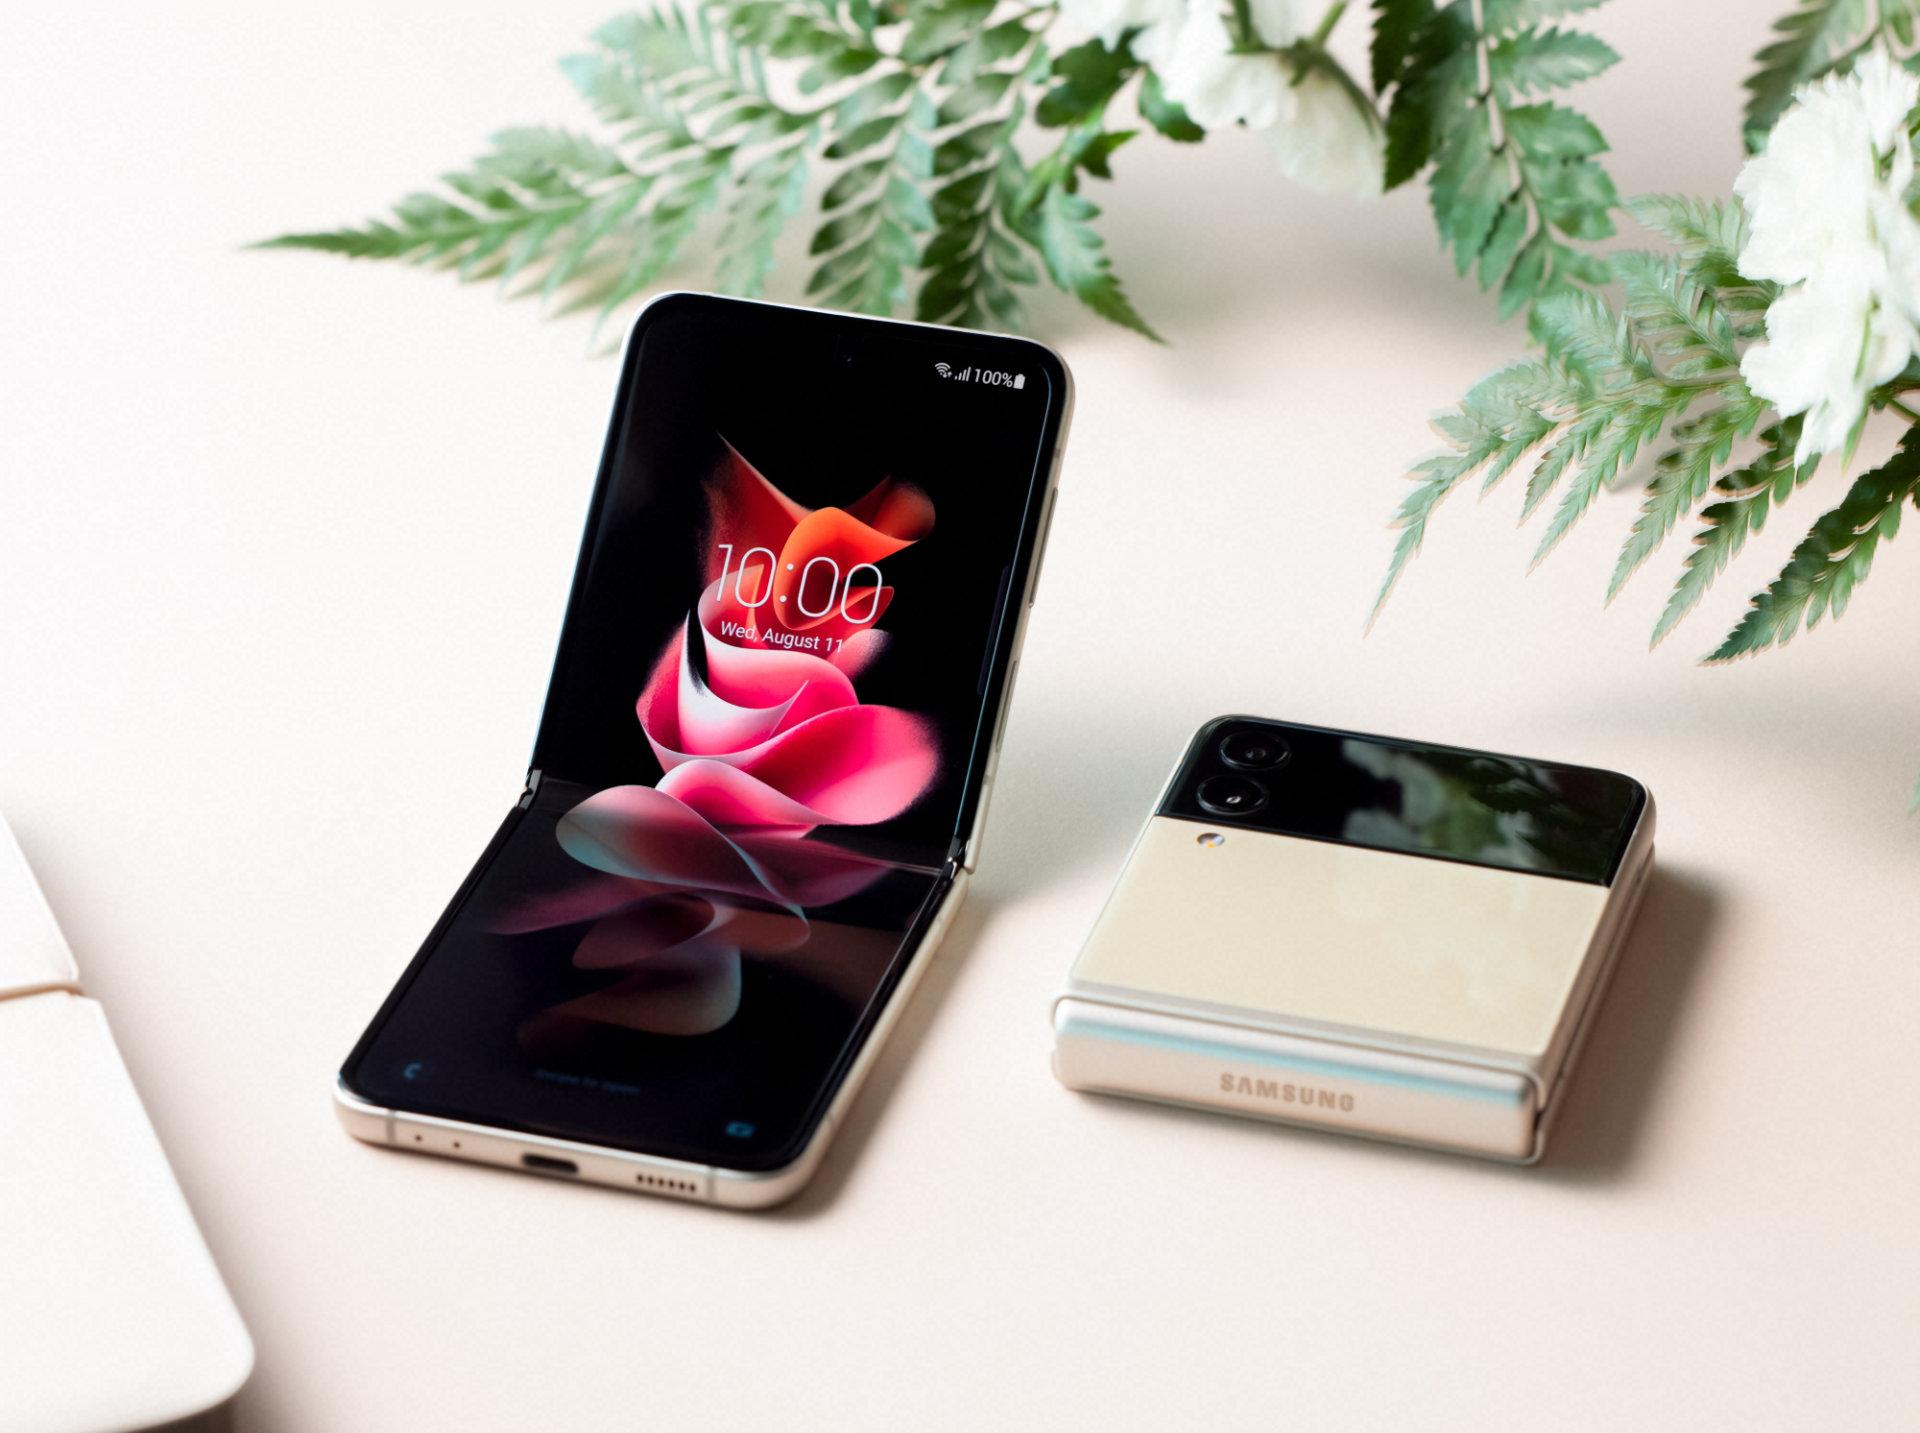 Samsung Galaxy Z Flip 3, Z Fold 3, Xiaomi Mix 4, Honor Magic 3 : pluie de présentations en août  – L'essentiel de l'actu de la semaine